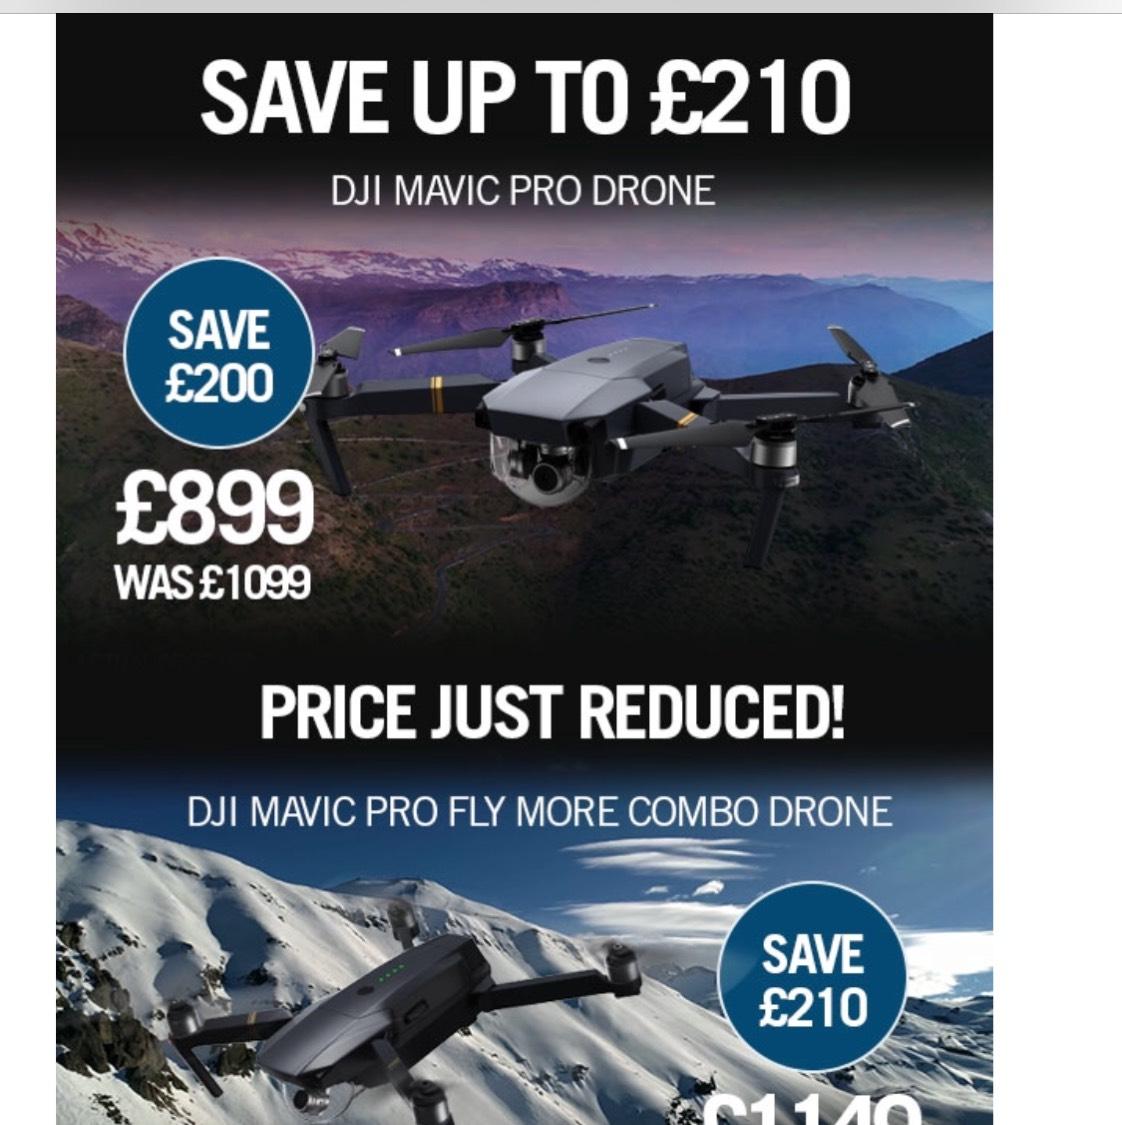 DJI Mavic Pro £200 off £899 @ Jessops - HotUKDeals